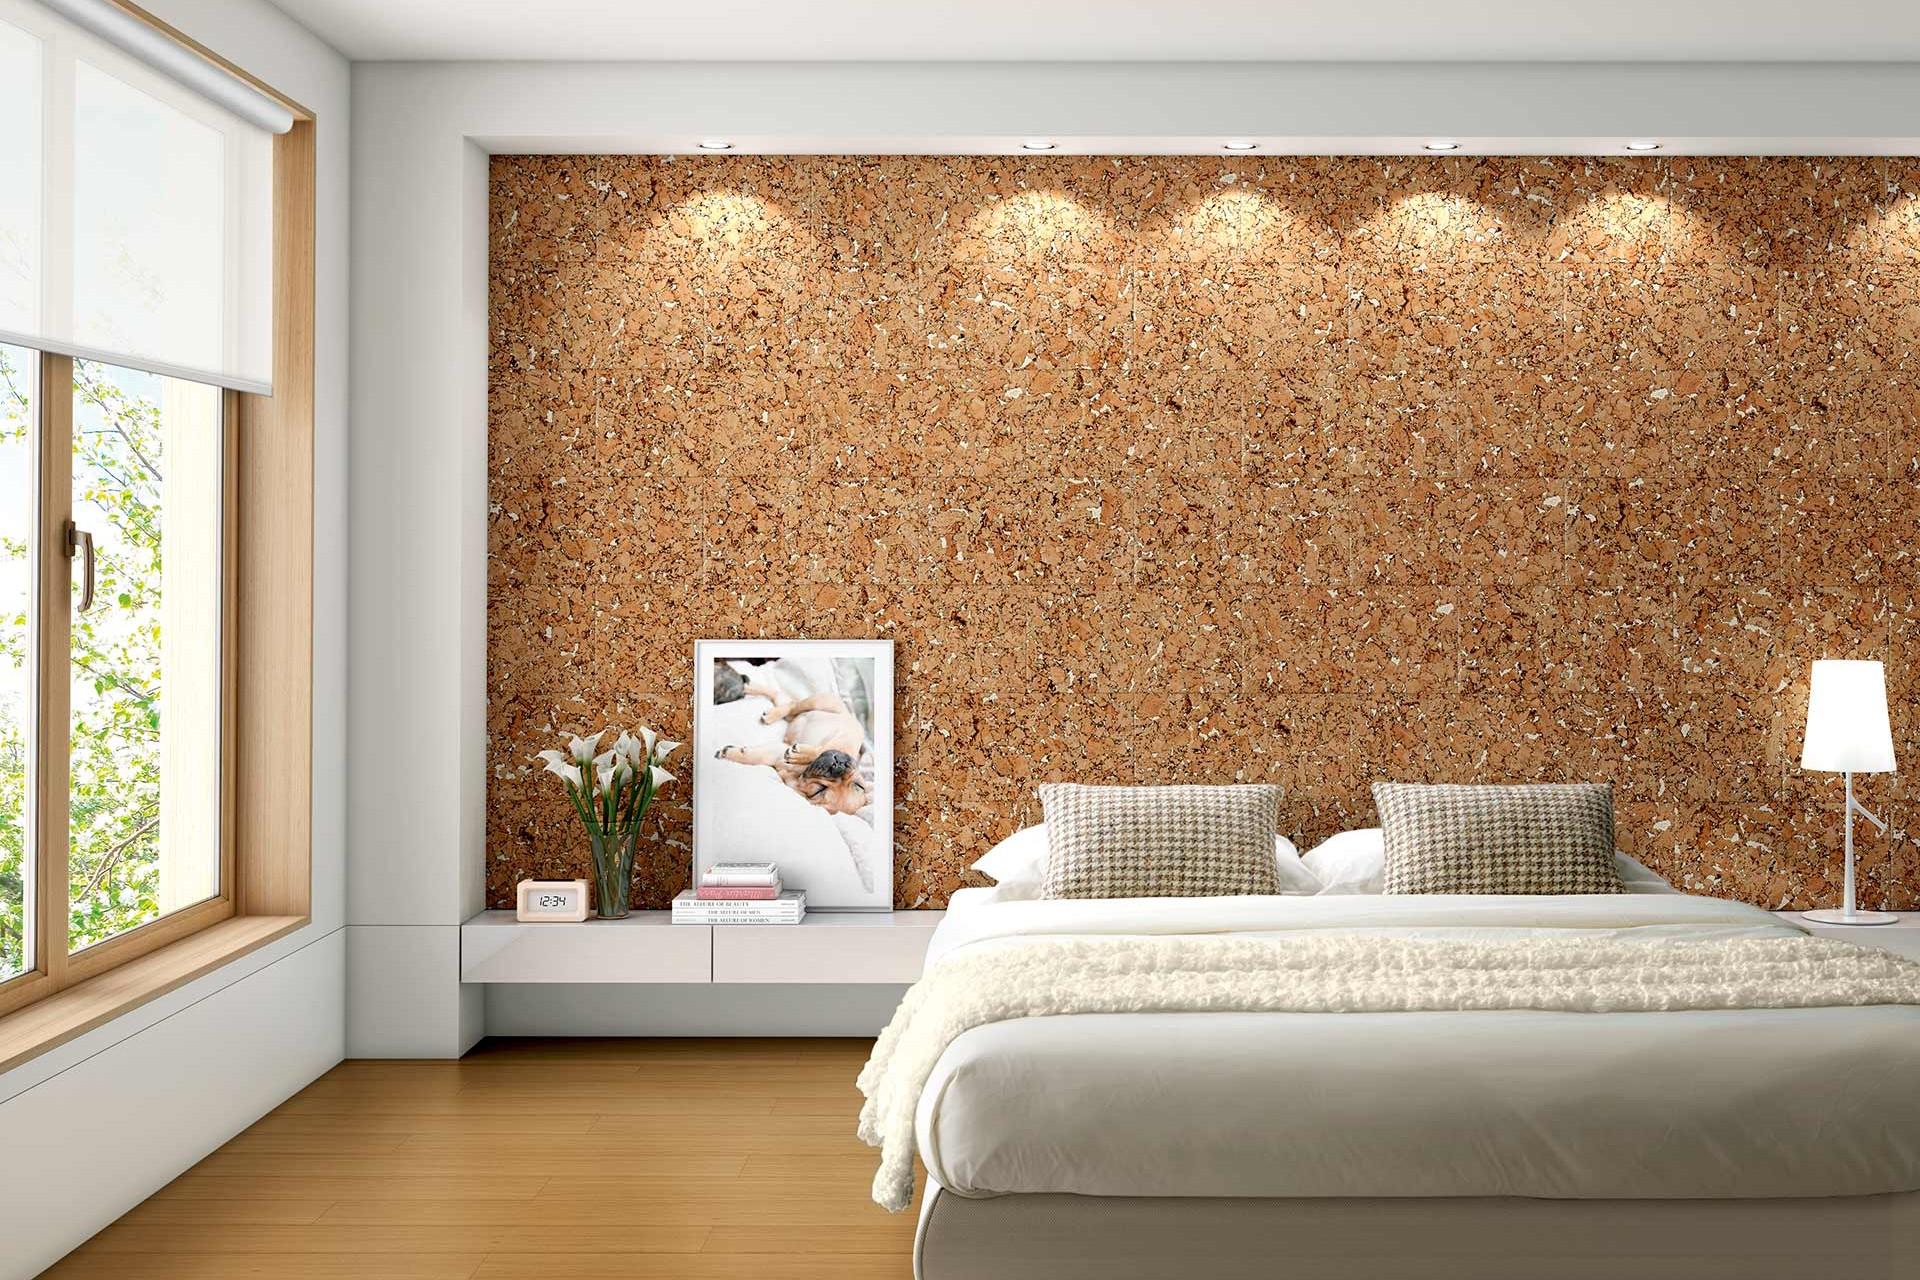 Cork headboard in bedroom